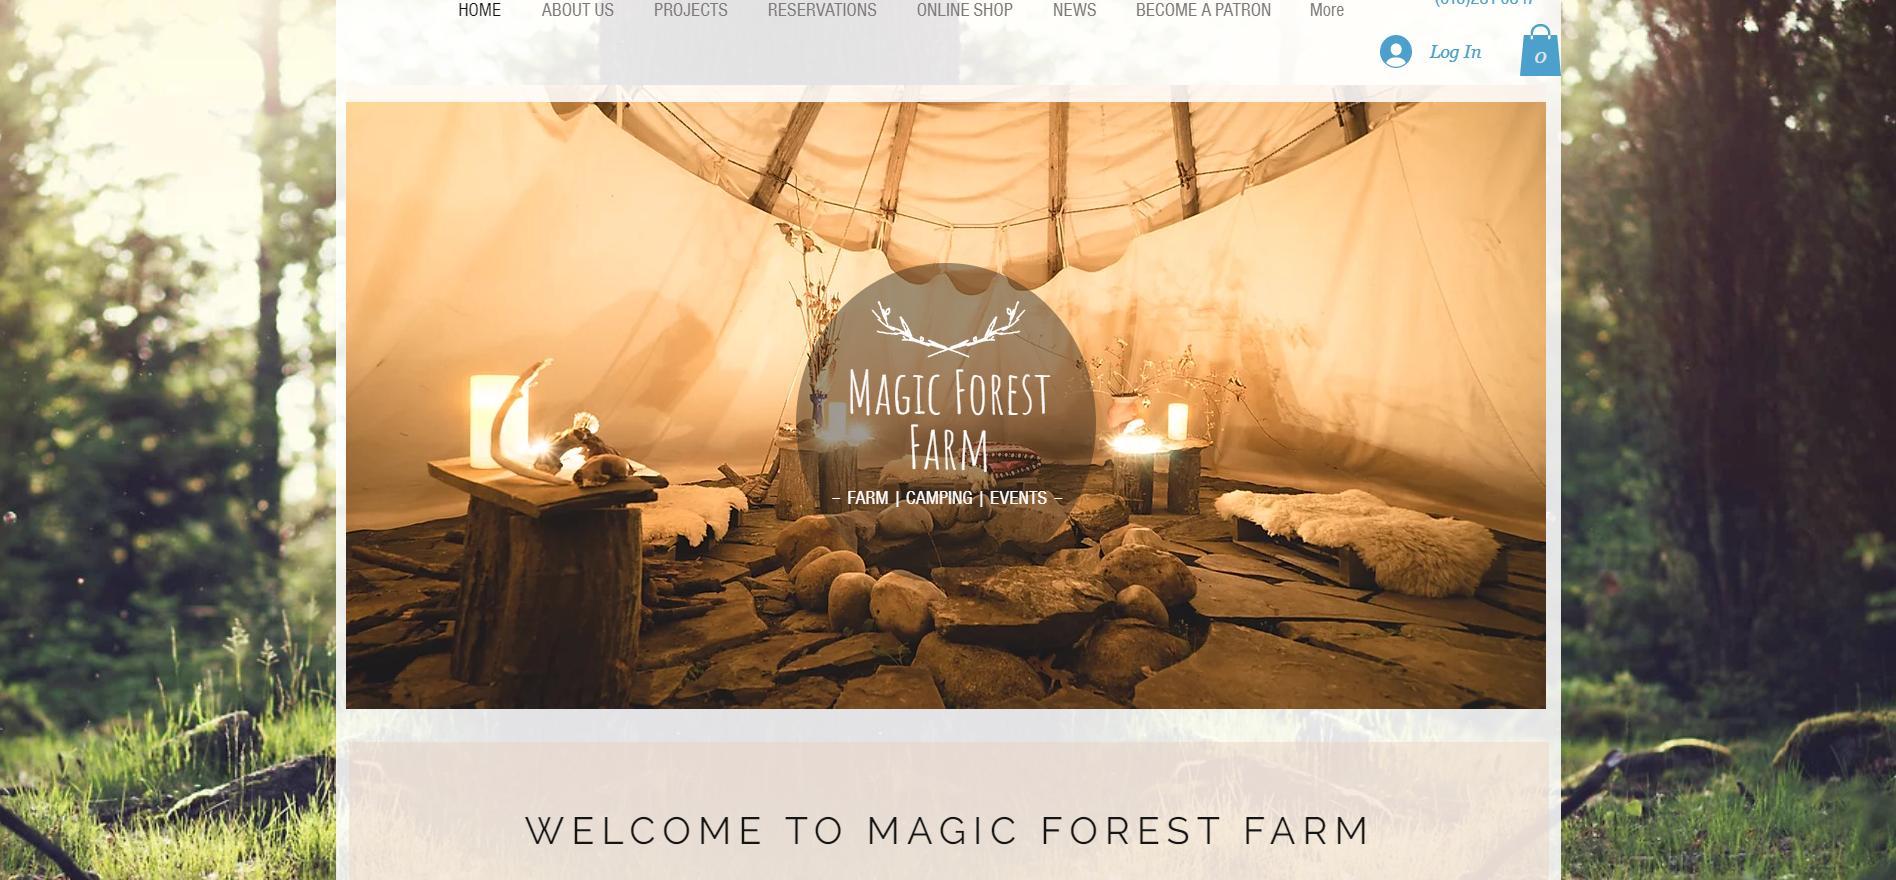 Magic forest farm - New York, USA